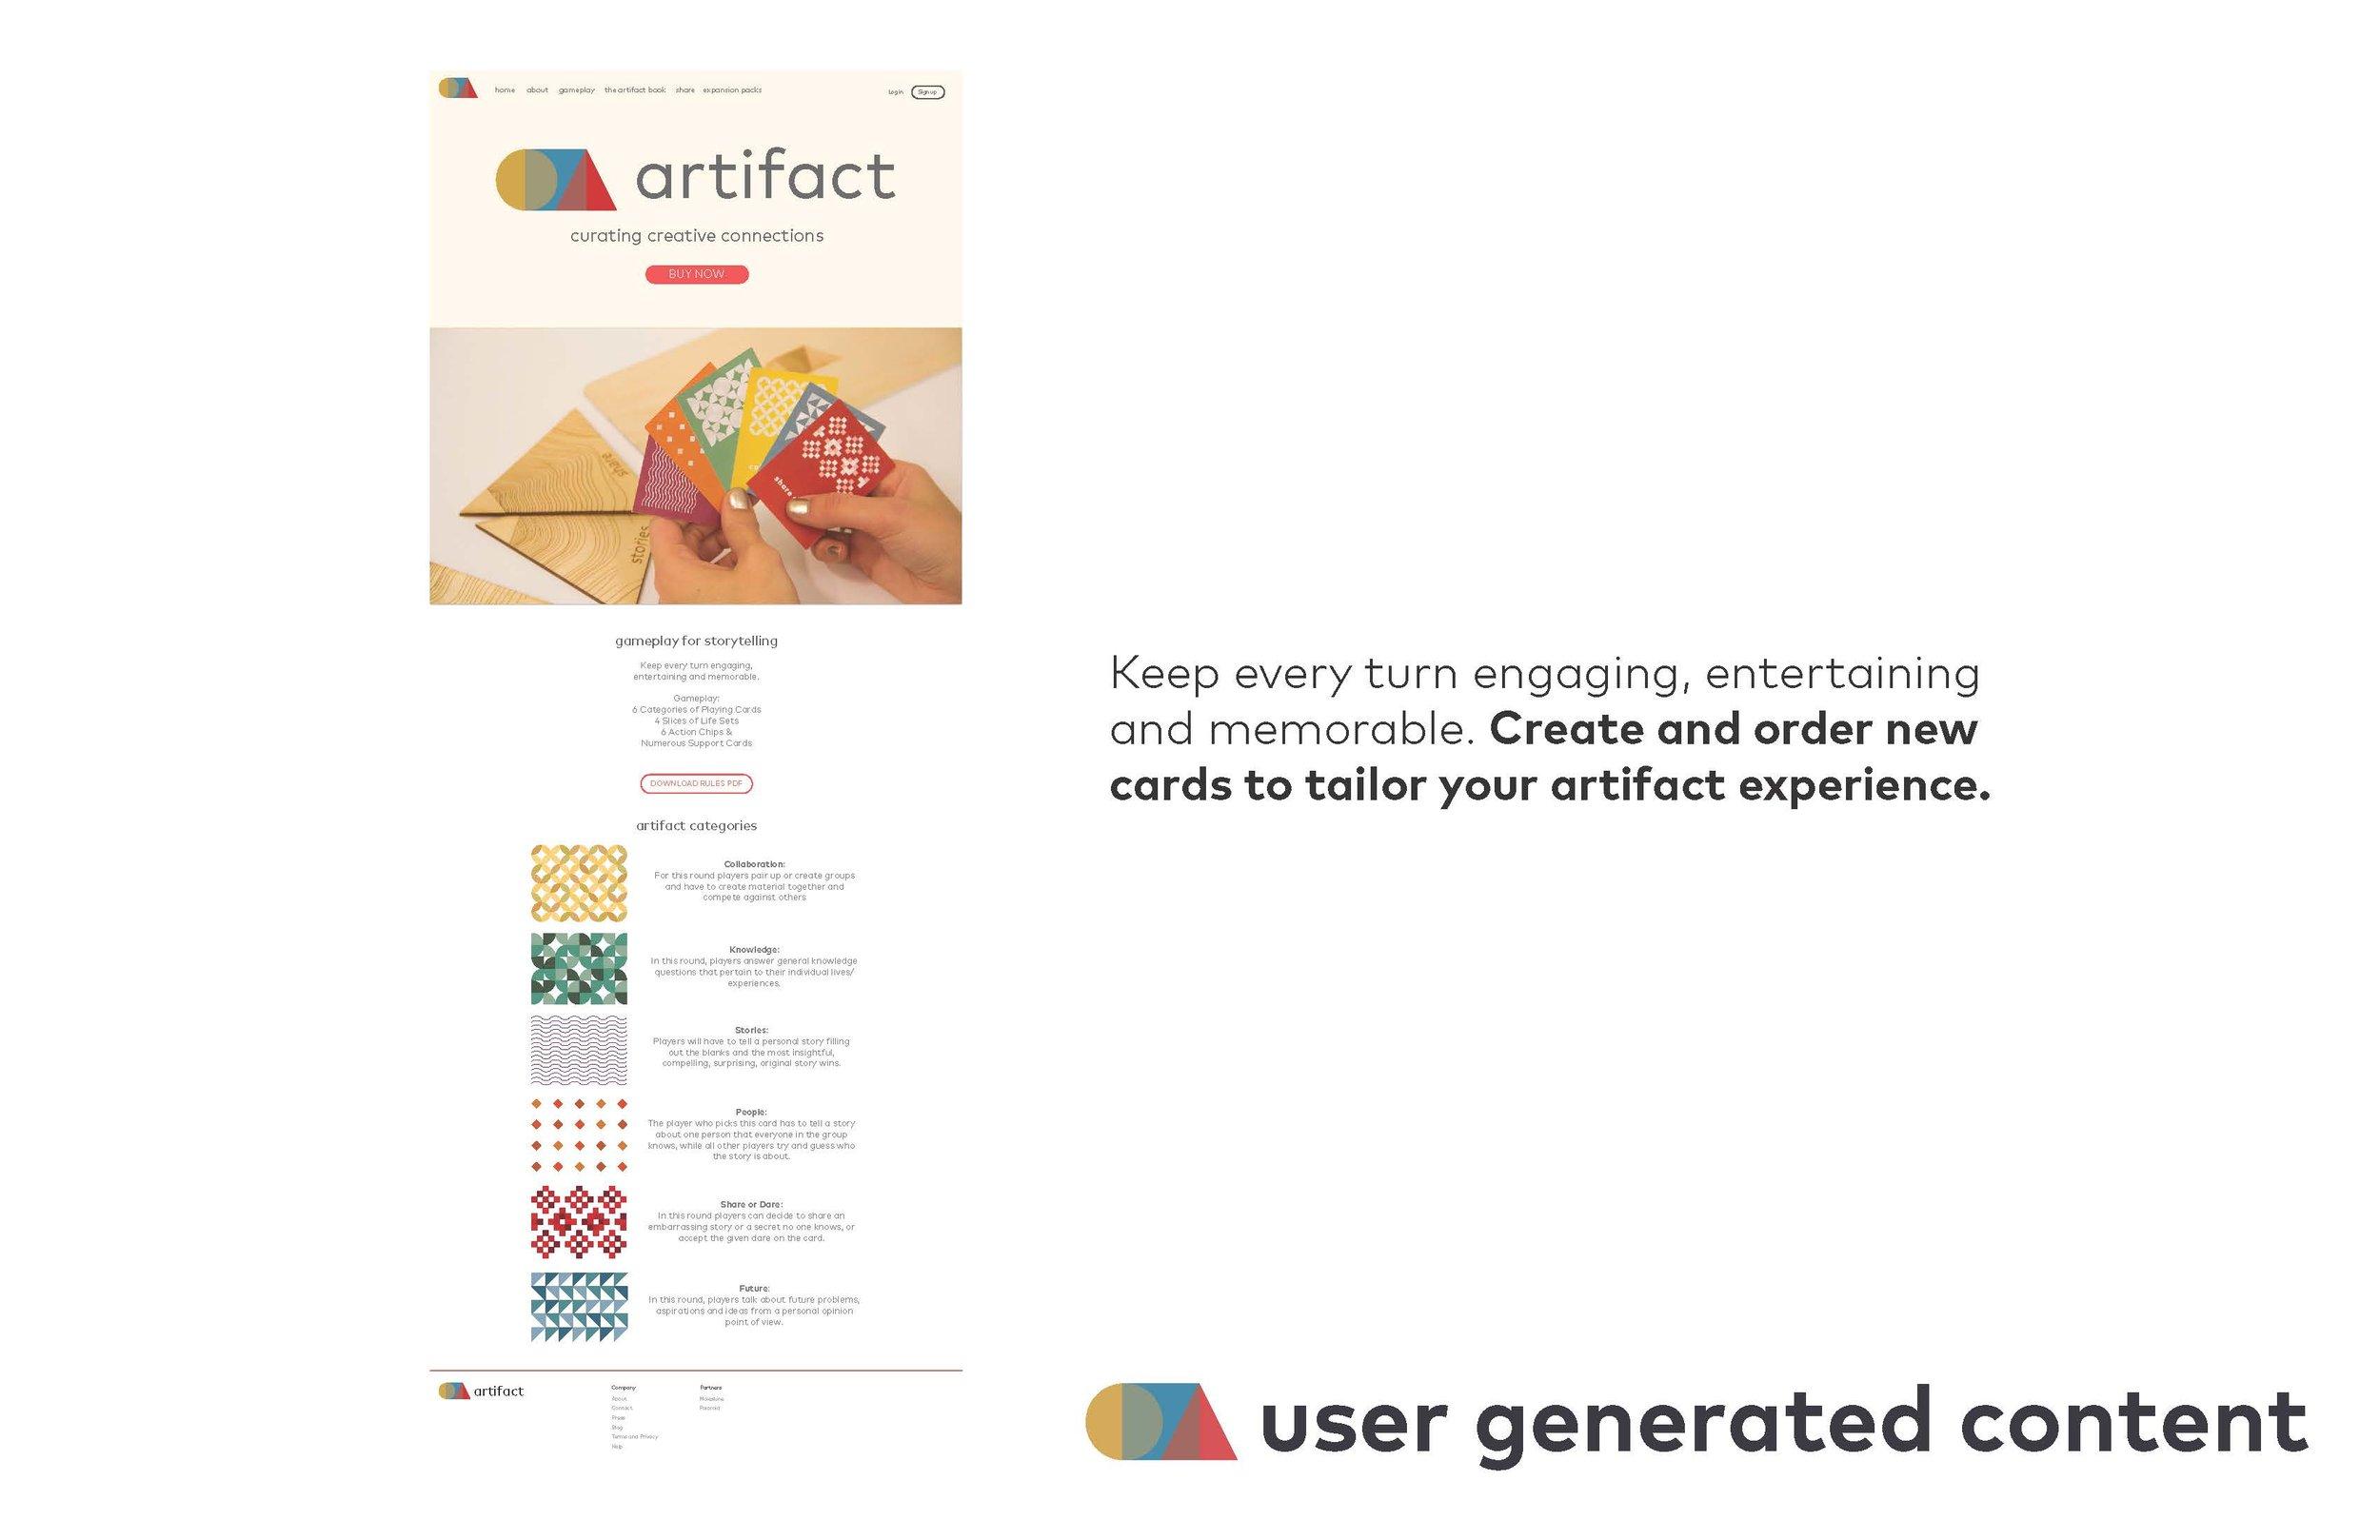 ArtifactFinalPresentation-1_Page_25.jpg